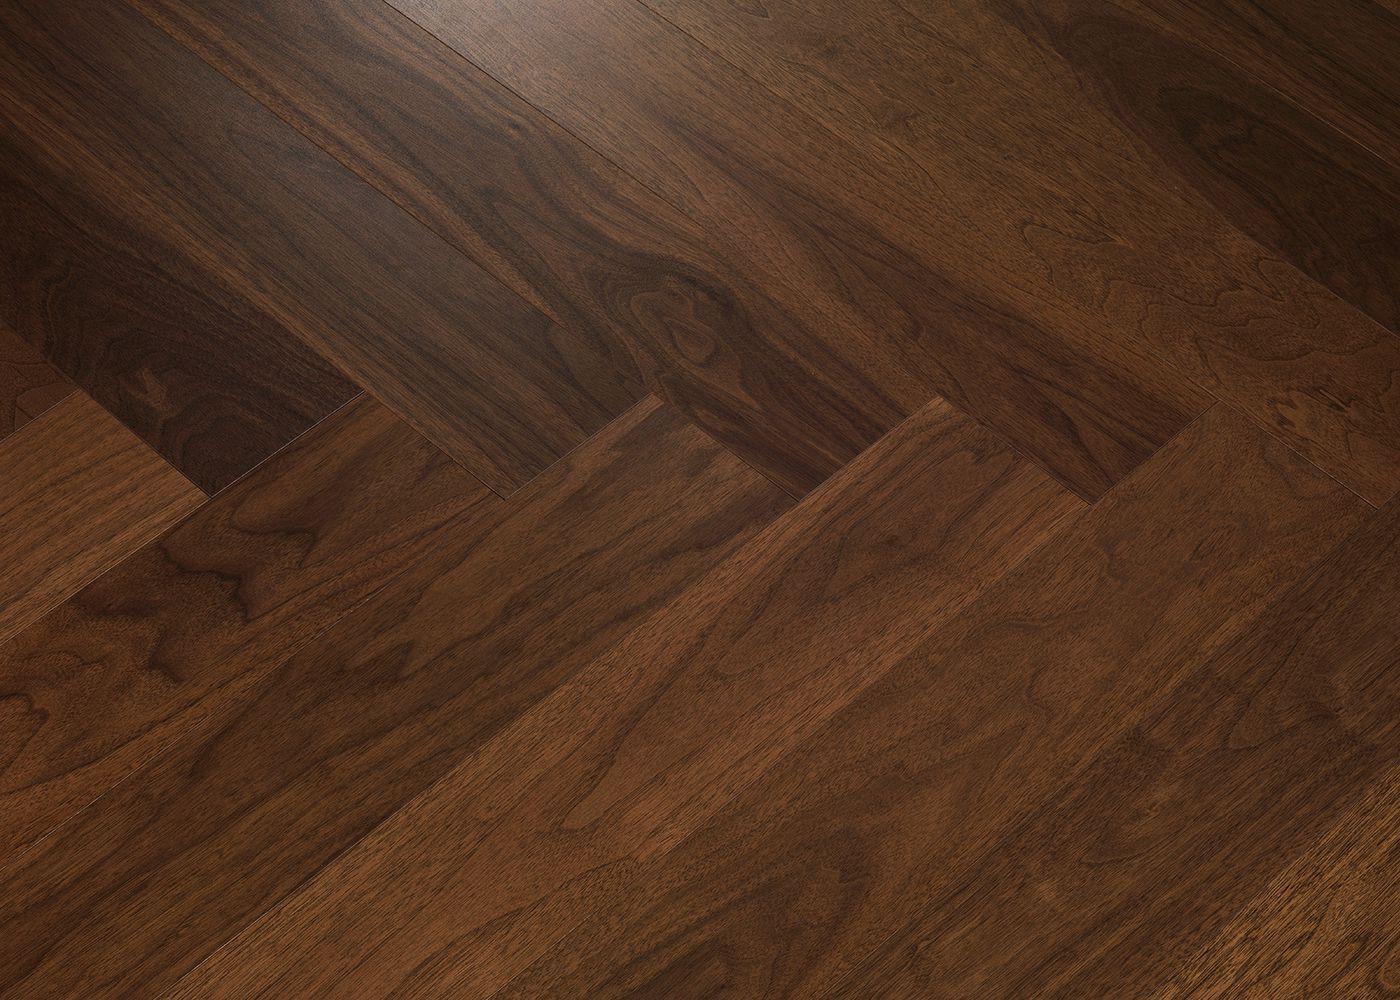 Sol plaqué bois Chêne NOYER brossé vernis extra-mat - Swing - Select 10x121x593